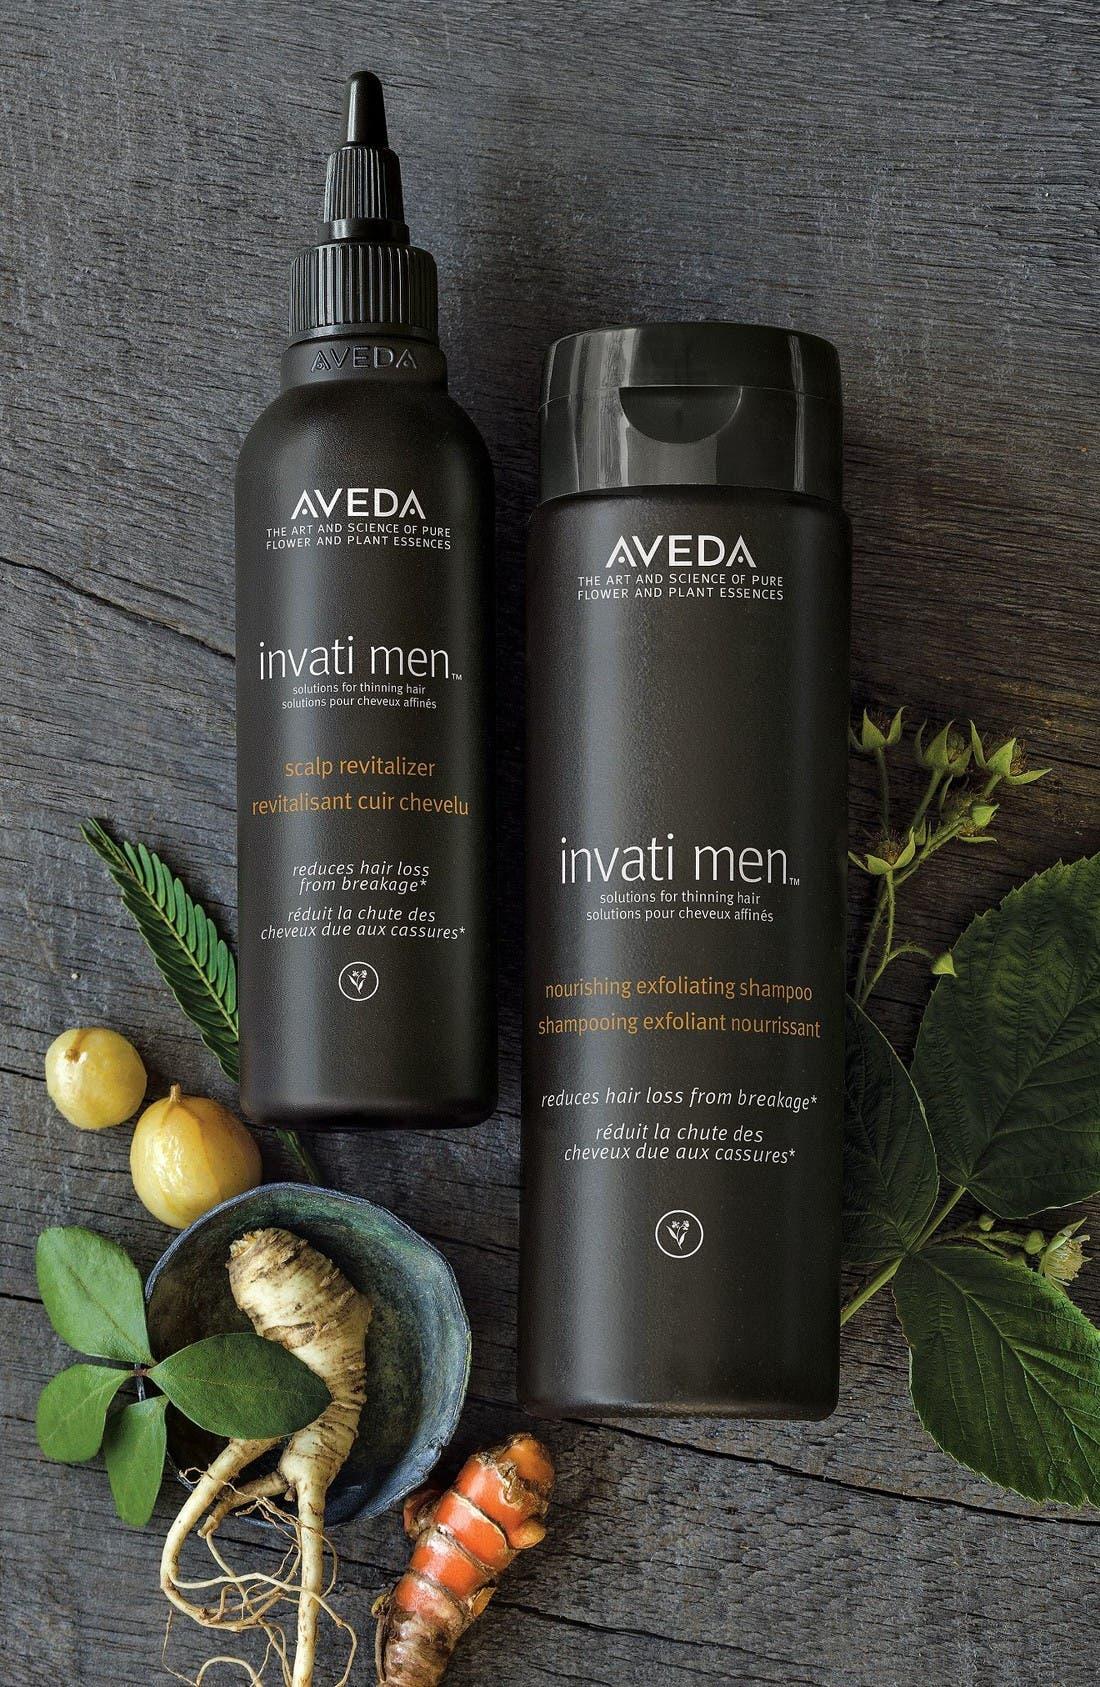 invati men<sup>™</sup> Nourishing Exfoliating Shampoo,                             Alternate thumbnail 2, color,                             No Color